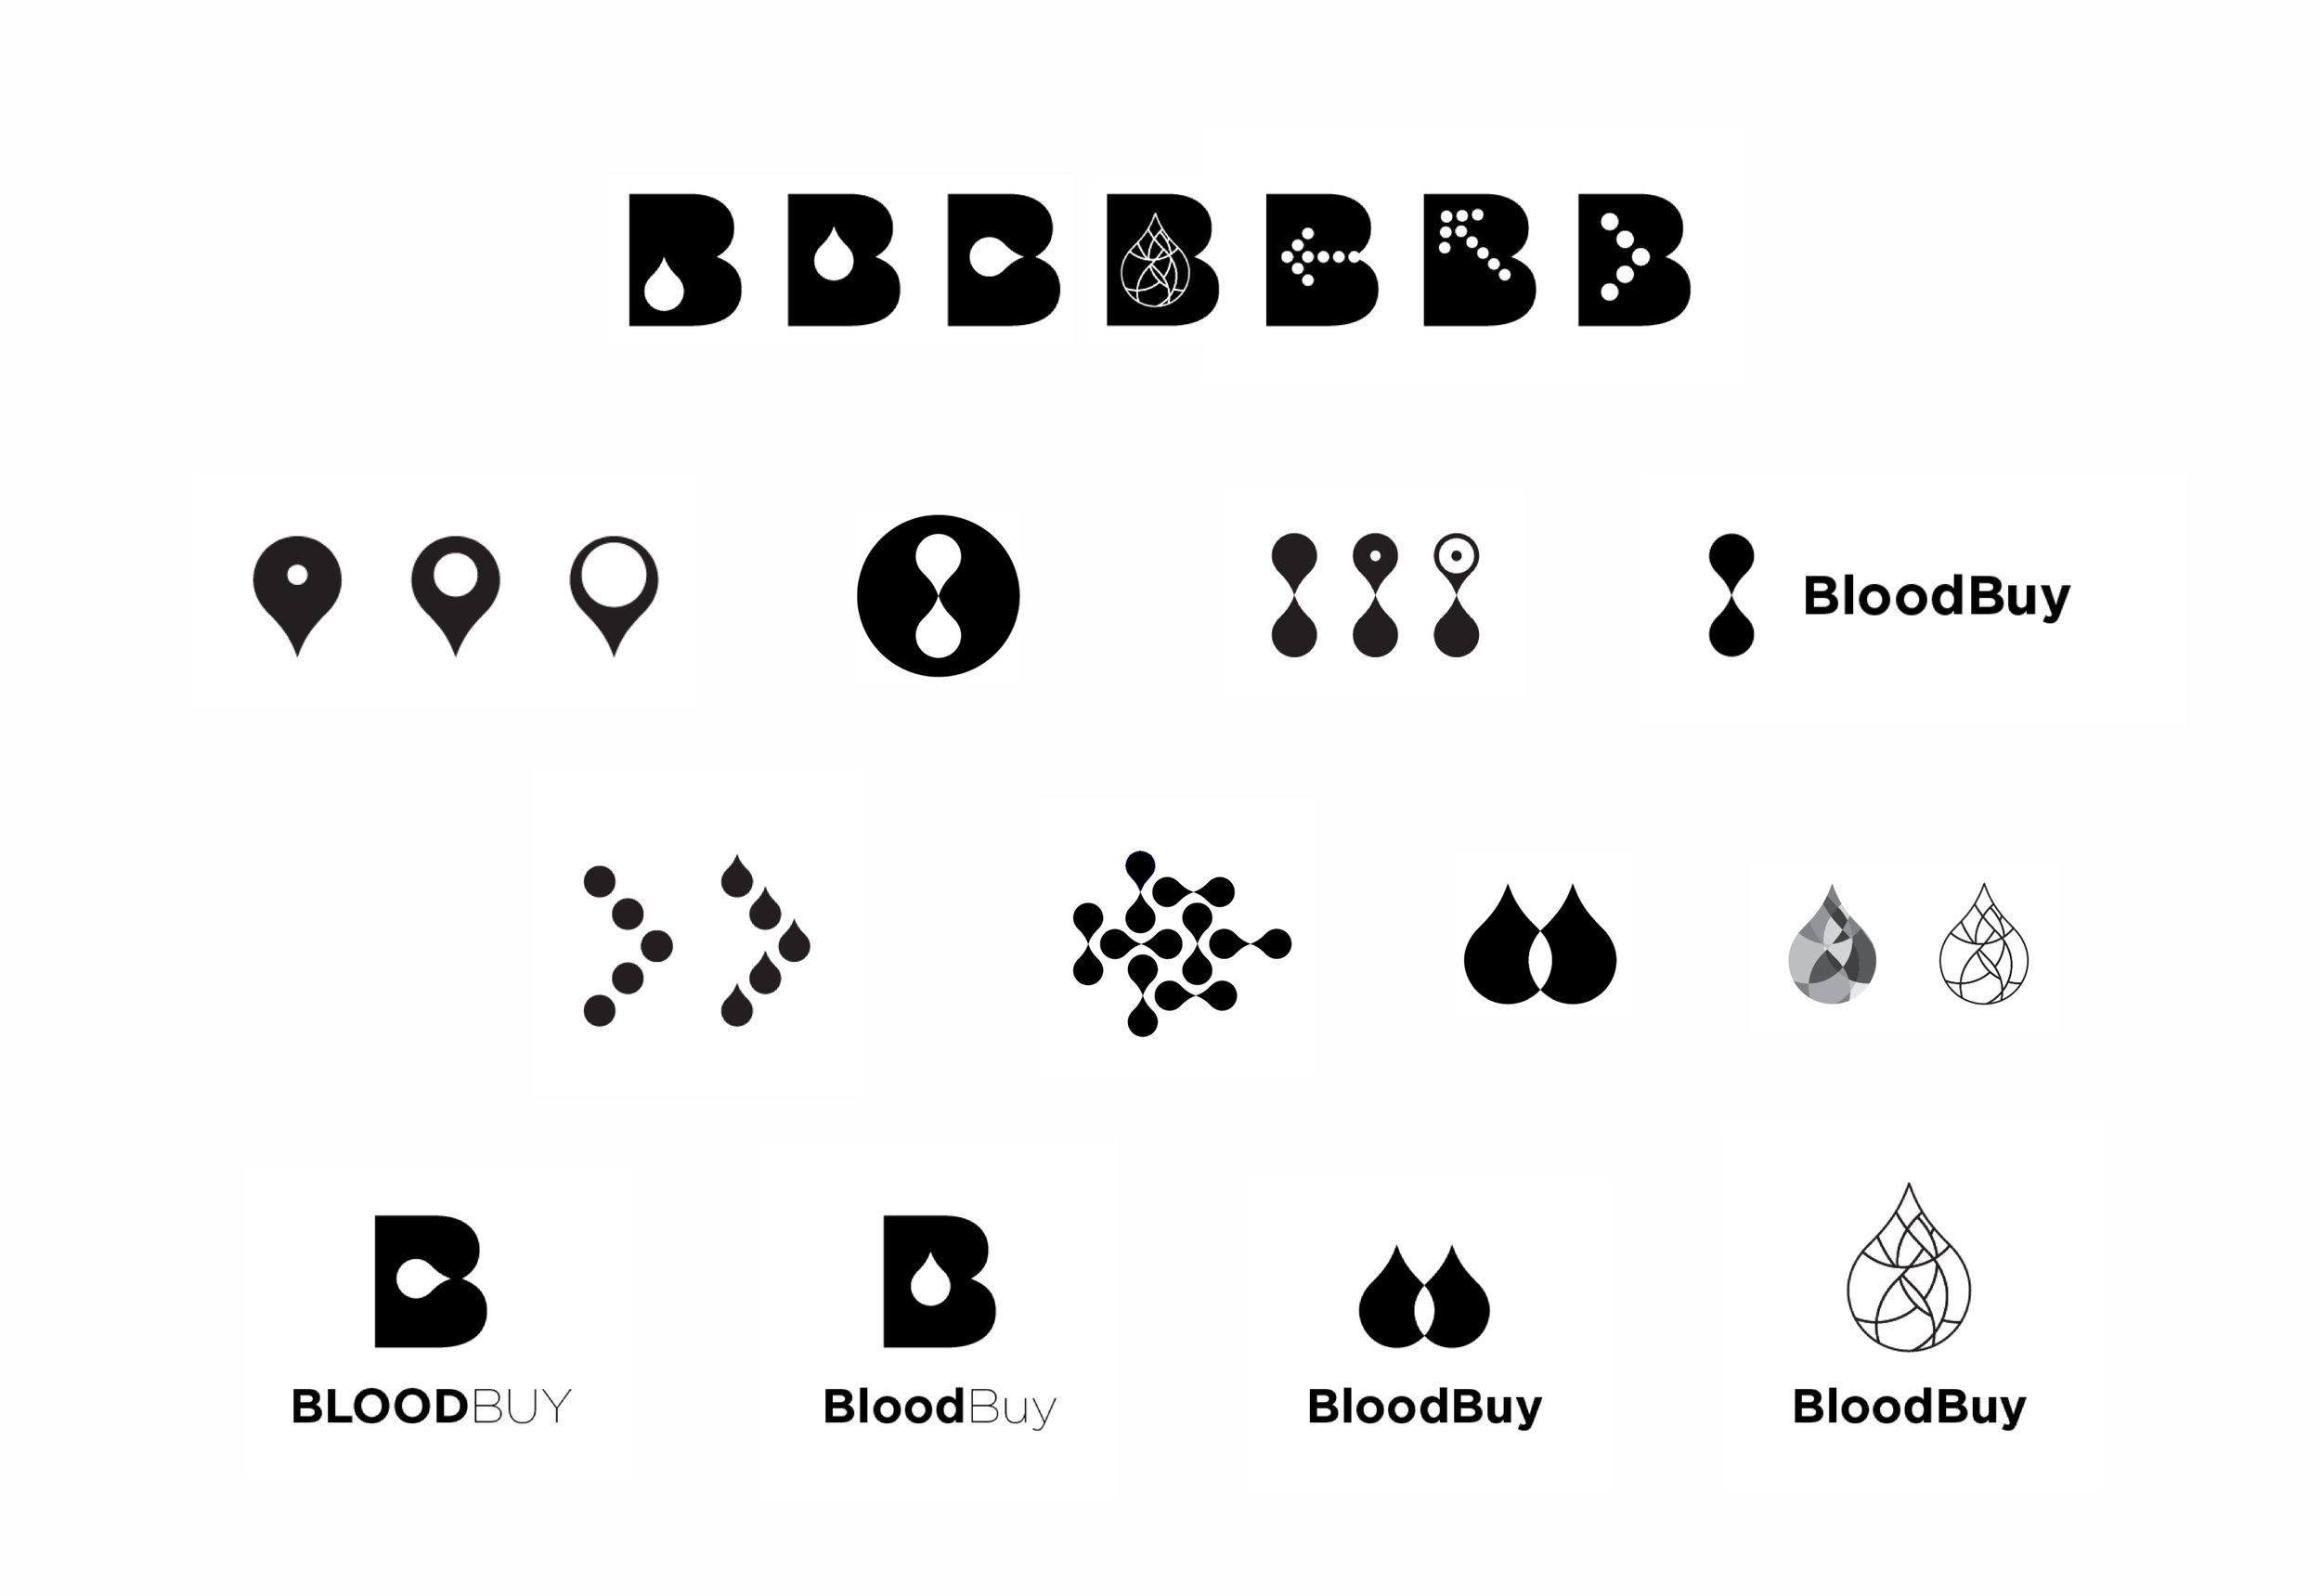 bloodbuy_process-04@2x.jpg